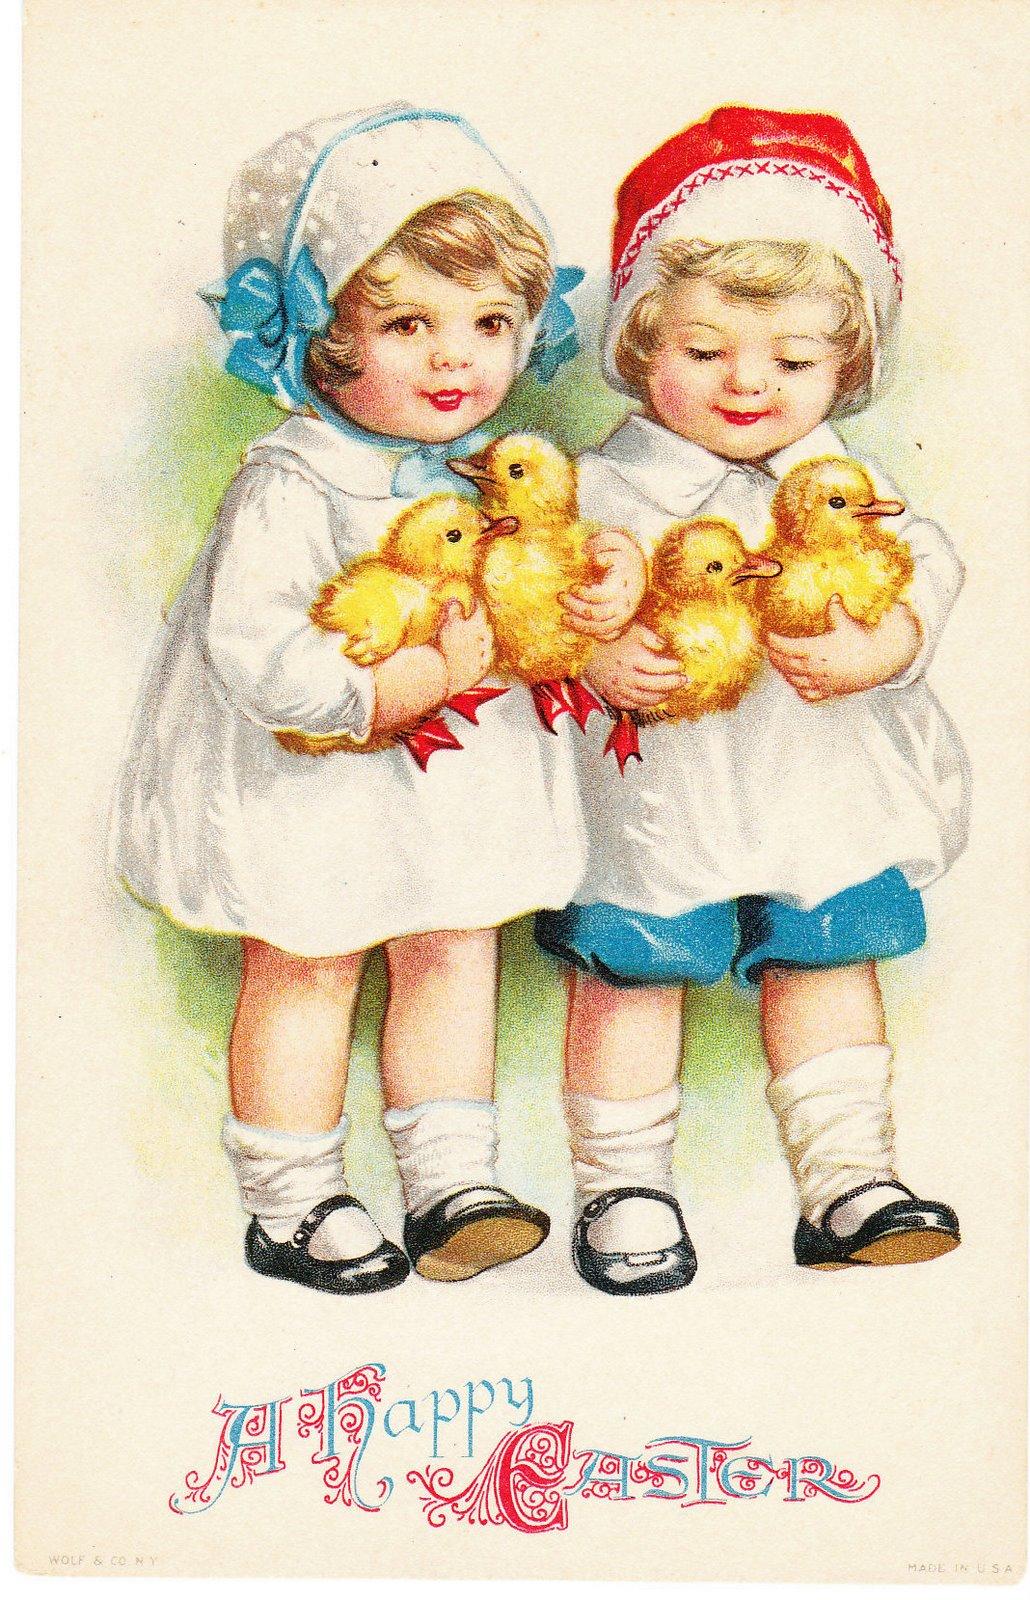 Vintage Kids Books My Kid Loves Koko S Kitten: Inkspired Musings: A Girly Girl Easter With Free